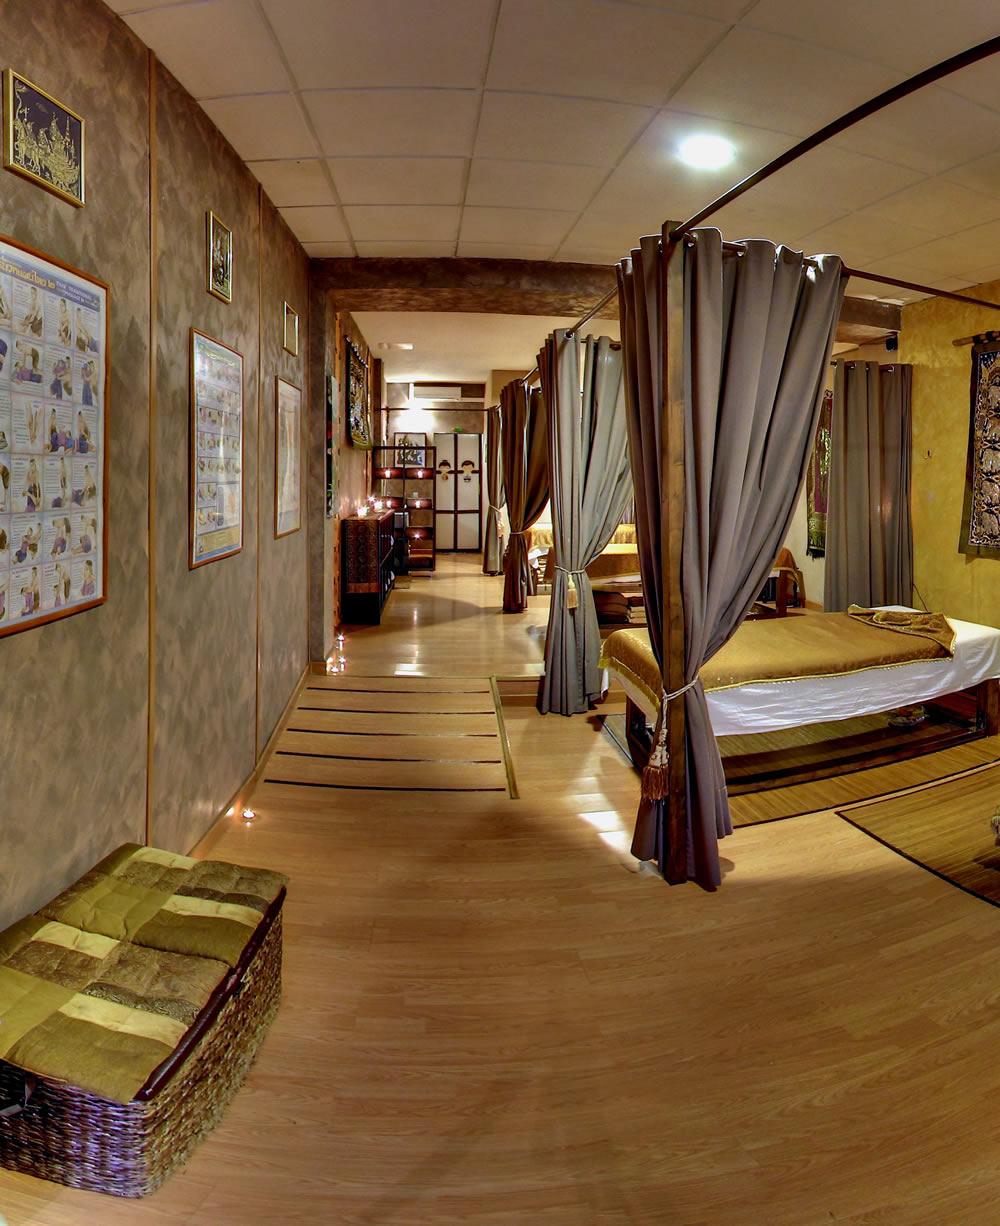 Spa Tthai Massage Benidorm Sawasdeeka Masajes Terapeuticos-tailandeses-